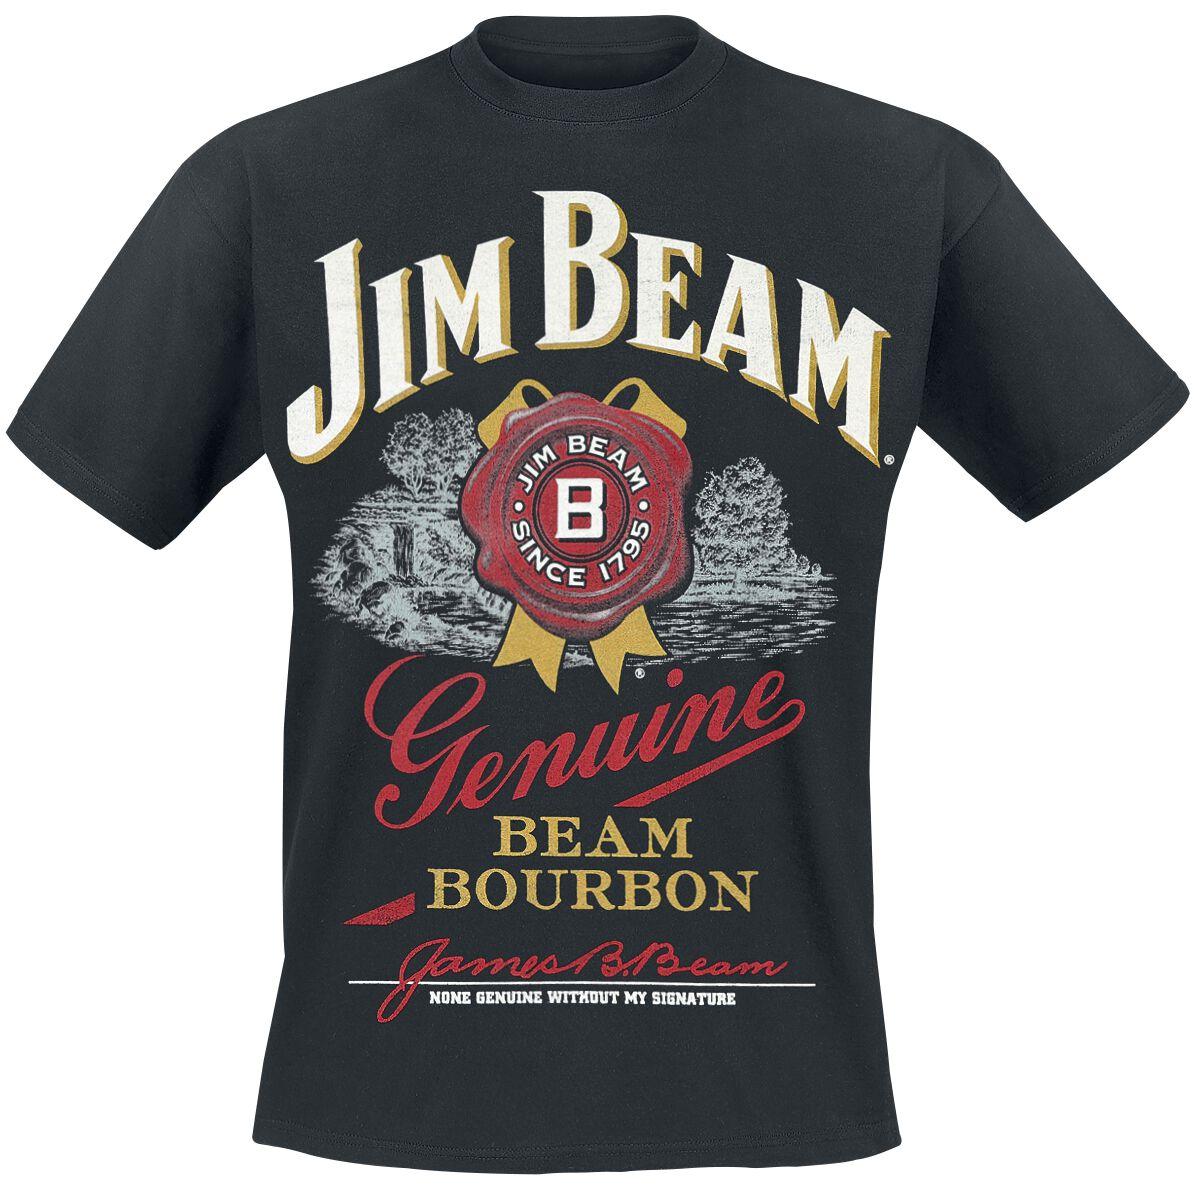 jim beam genuine beam bourbon t shirt schwarz ebay. Black Bedroom Furniture Sets. Home Design Ideas